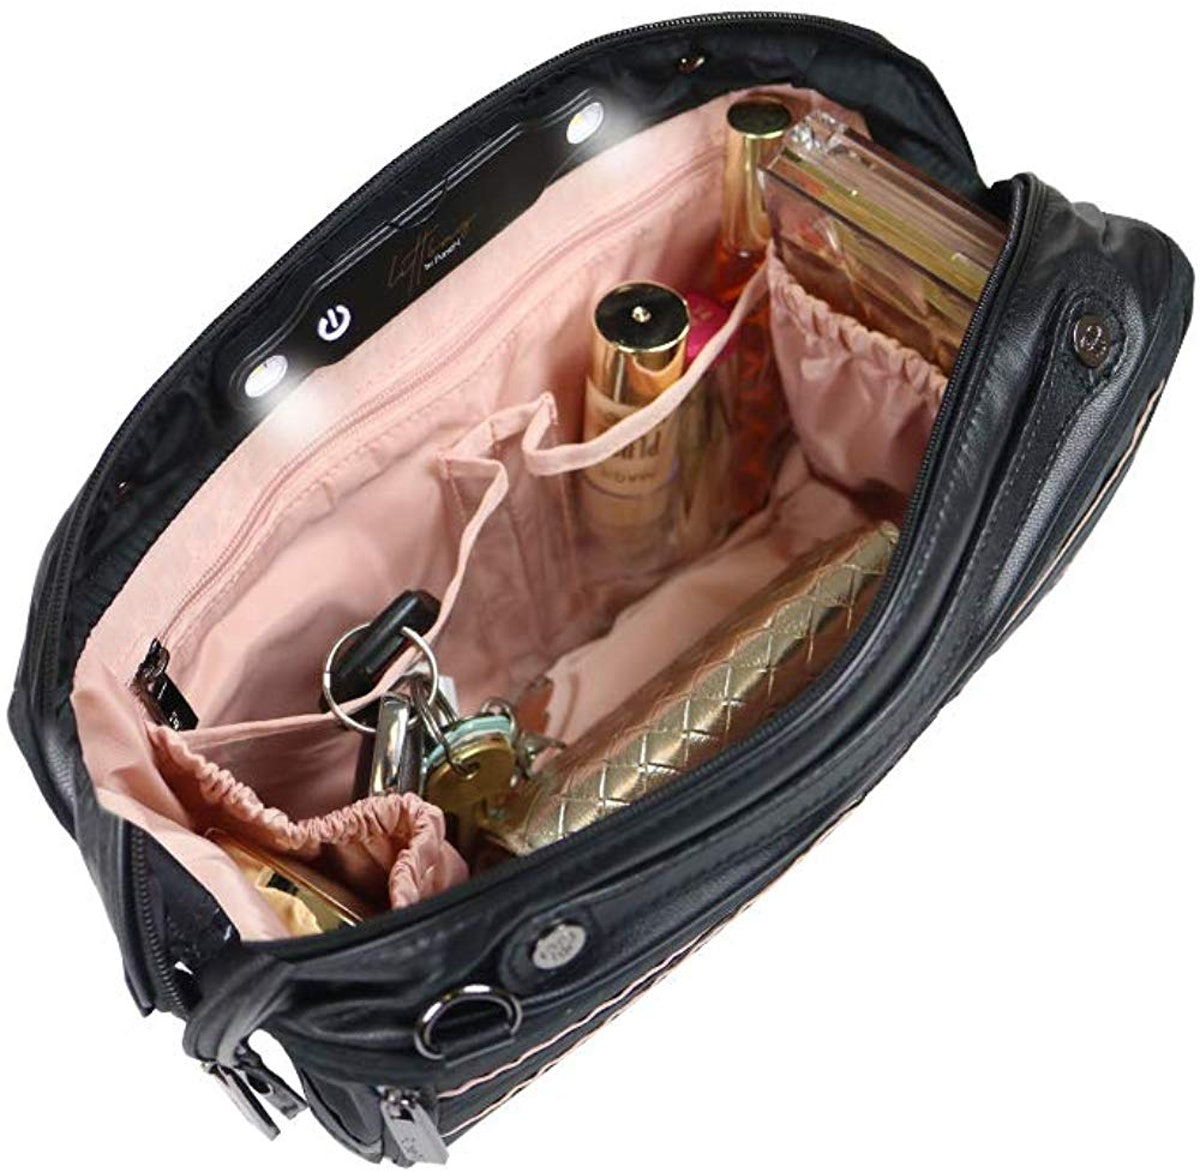 PurseN LittBag LED Lighted Handbag Organizer